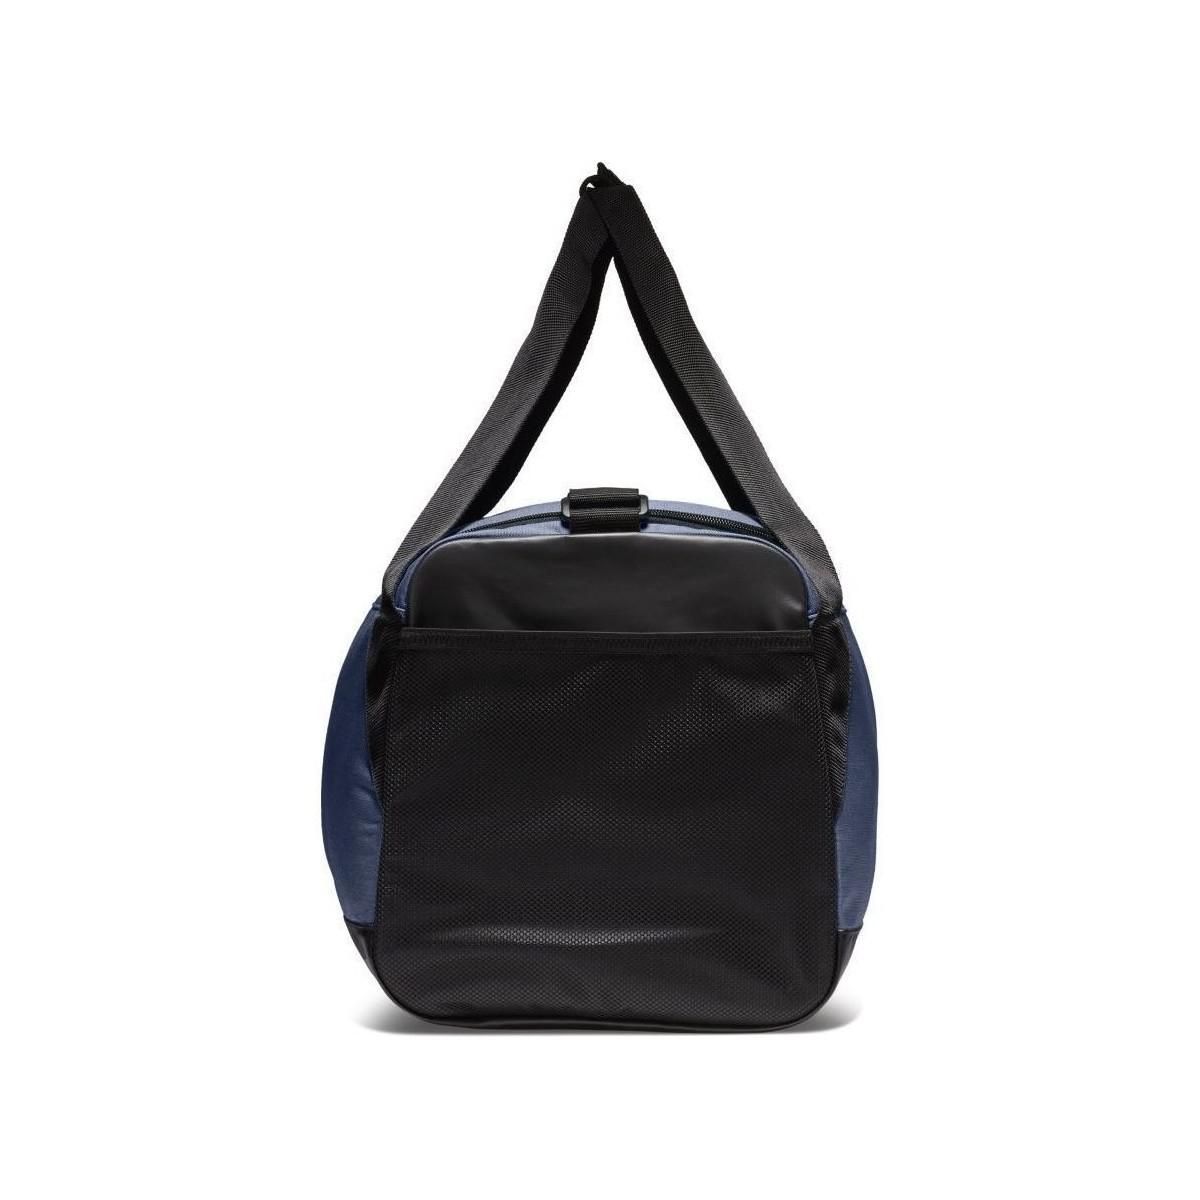 9453134ff6 Nike - Blue Brasilia Duffel Men s Sports Bag In Multicolour for Men - Lyst.  View fullscreen